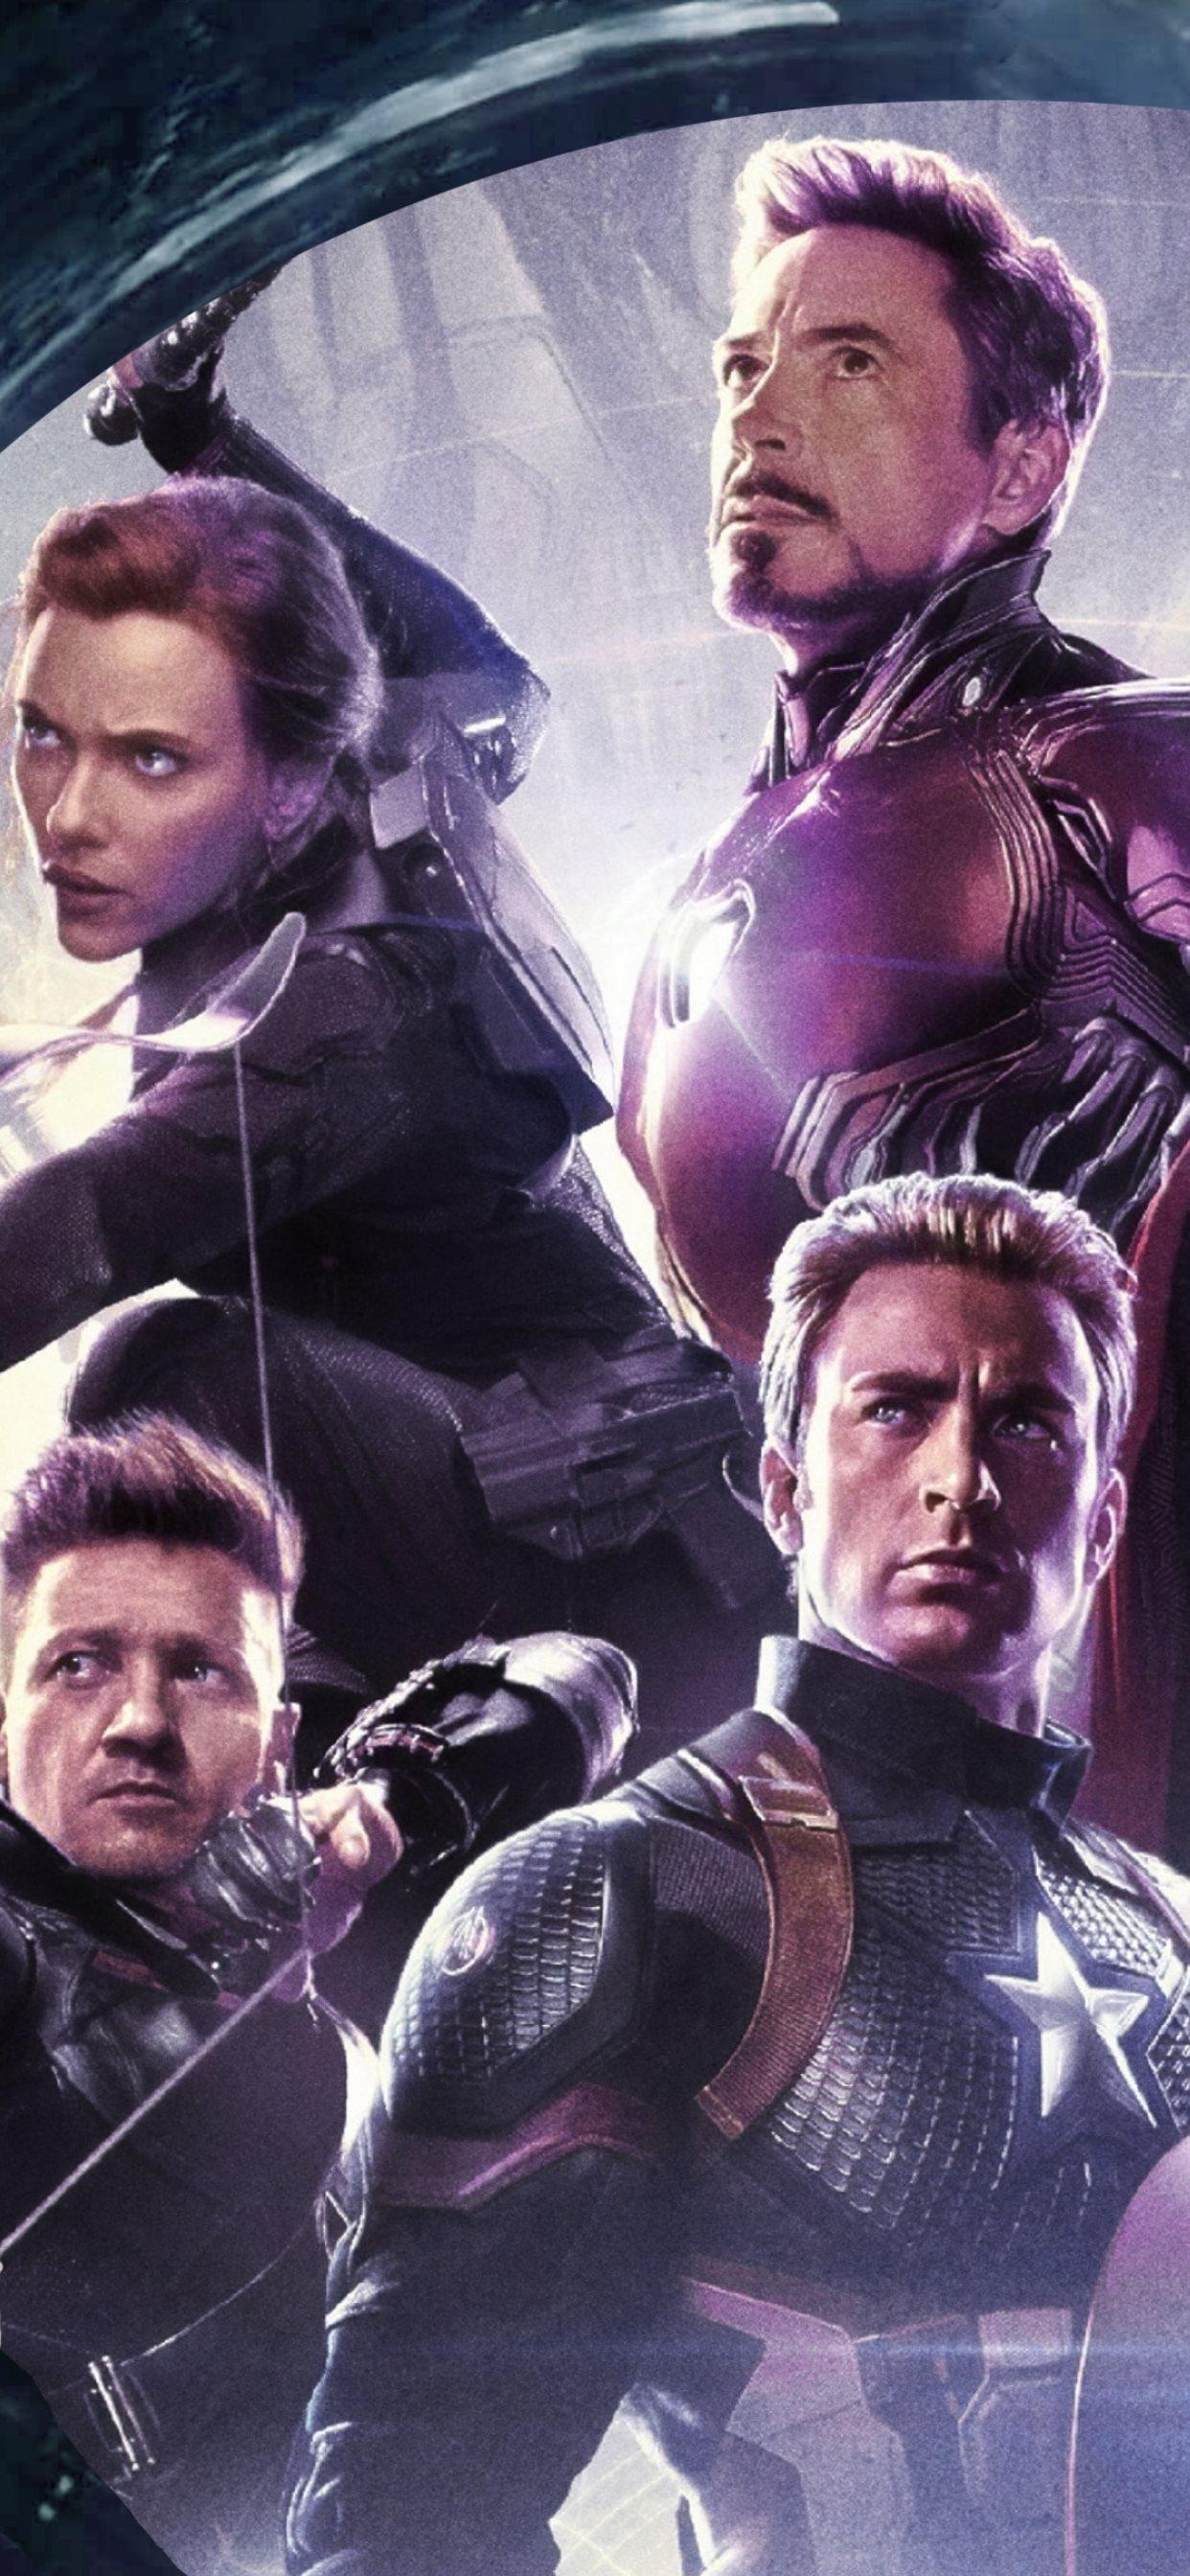 4k 2019 Avengers Endgame Original Six Iphone 11 Wallpapers Free Download